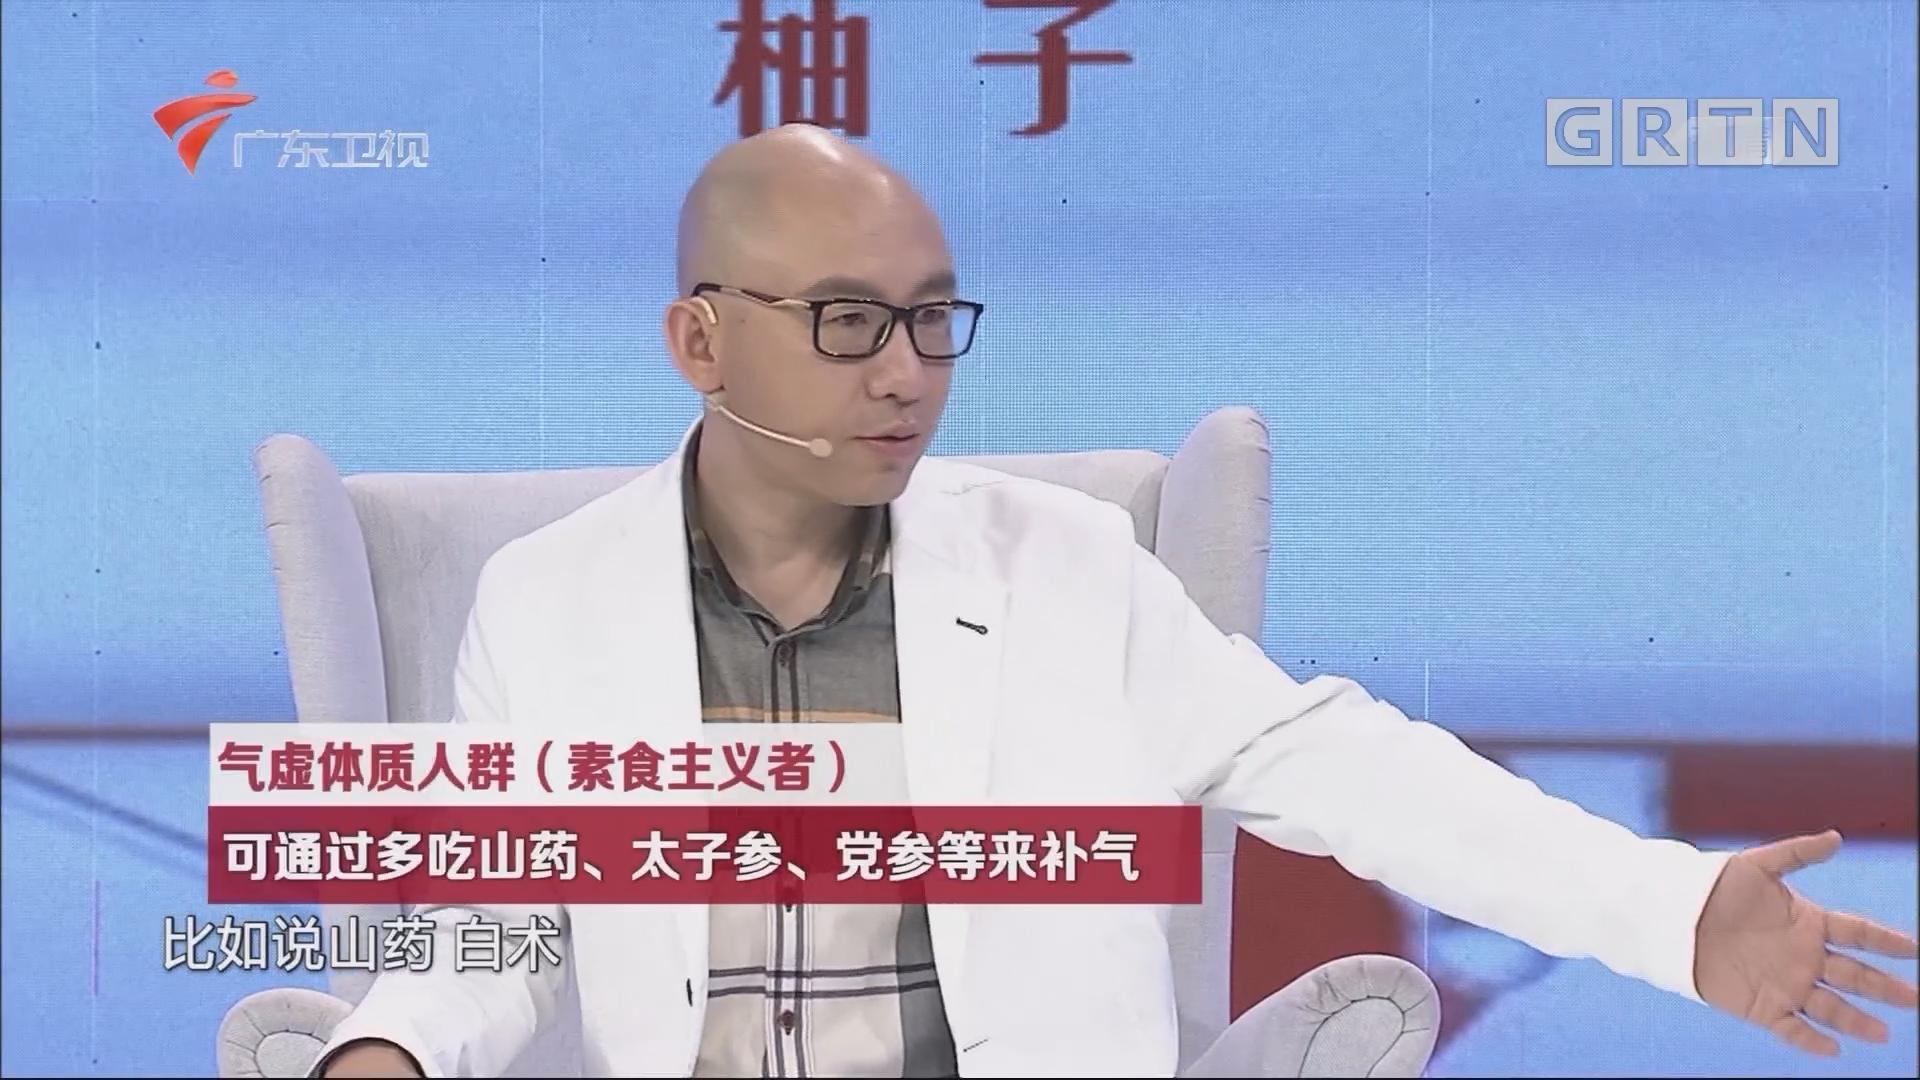 [HD][2018-03-16]健康有道:《与美丽同行》科学瘦身健康又美丽